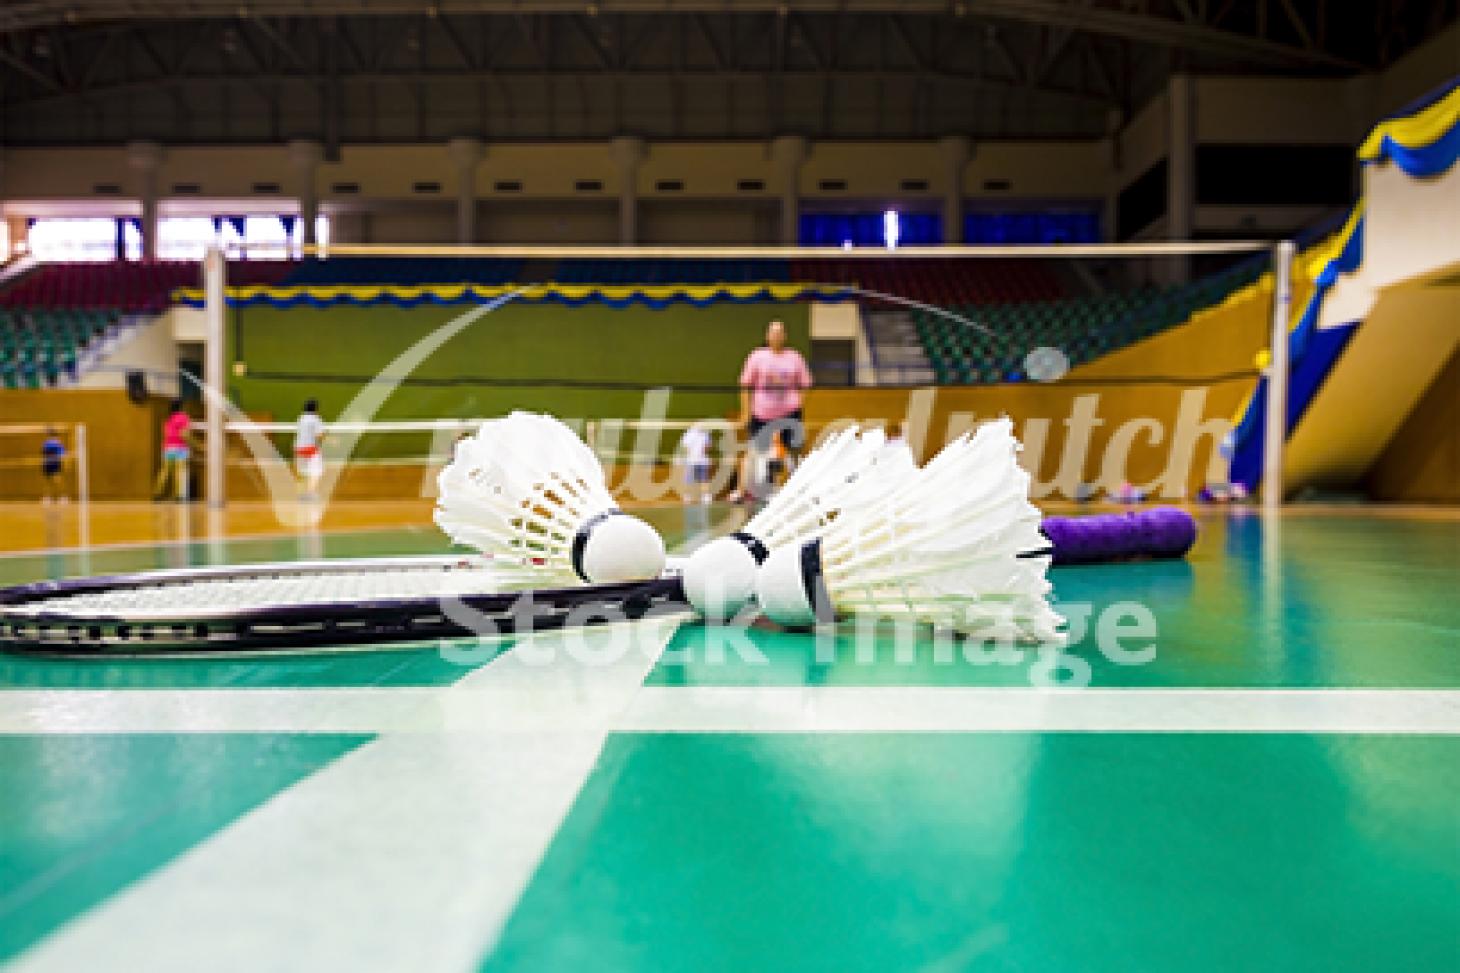 Watford Leisure Centre - Woodside Indoor | Hard badminton court